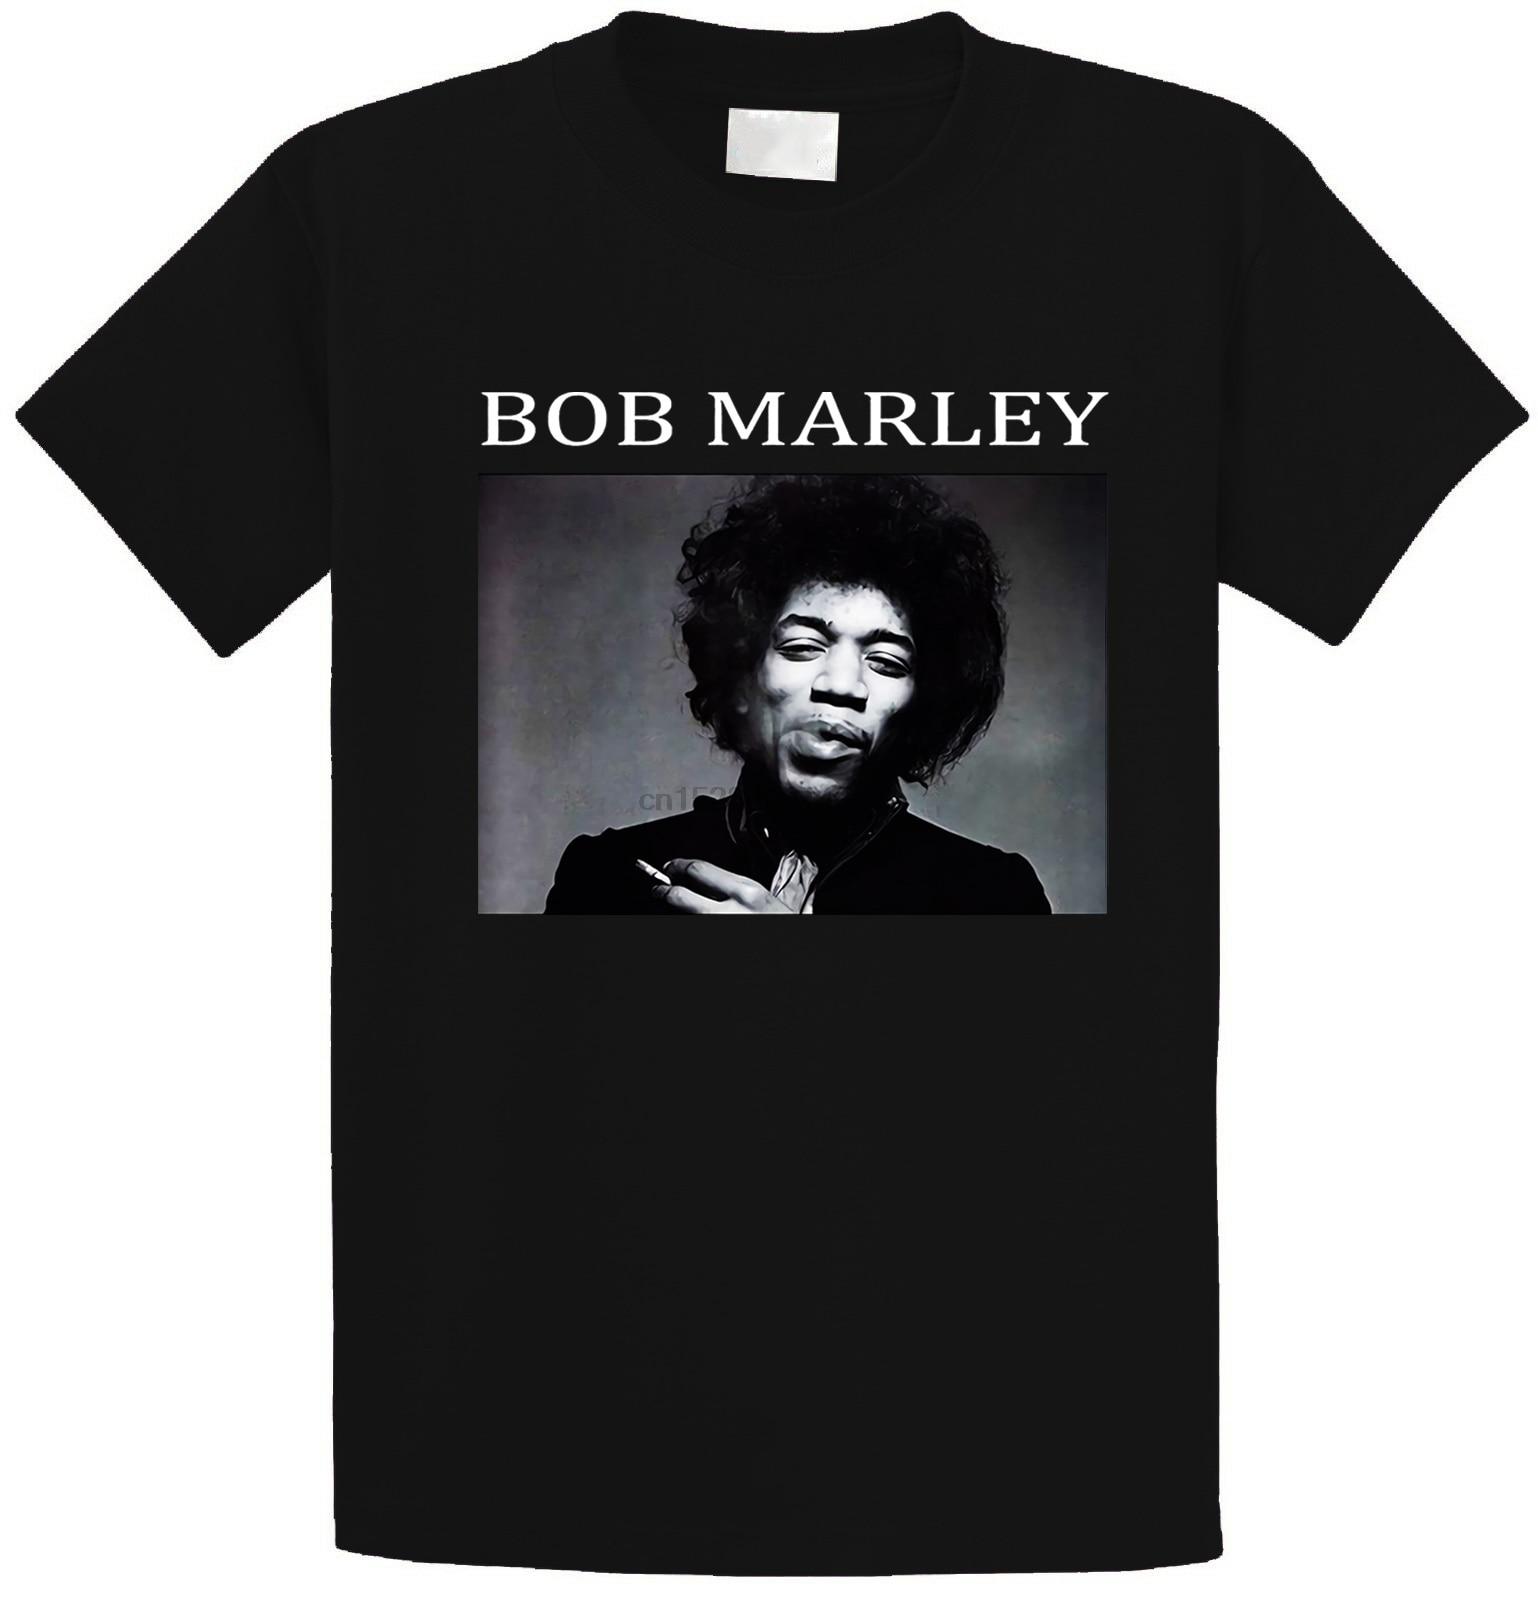 TRVPPY Damen T-Shirt Shirt Modell Bob Marley One Love Music XS-XXL